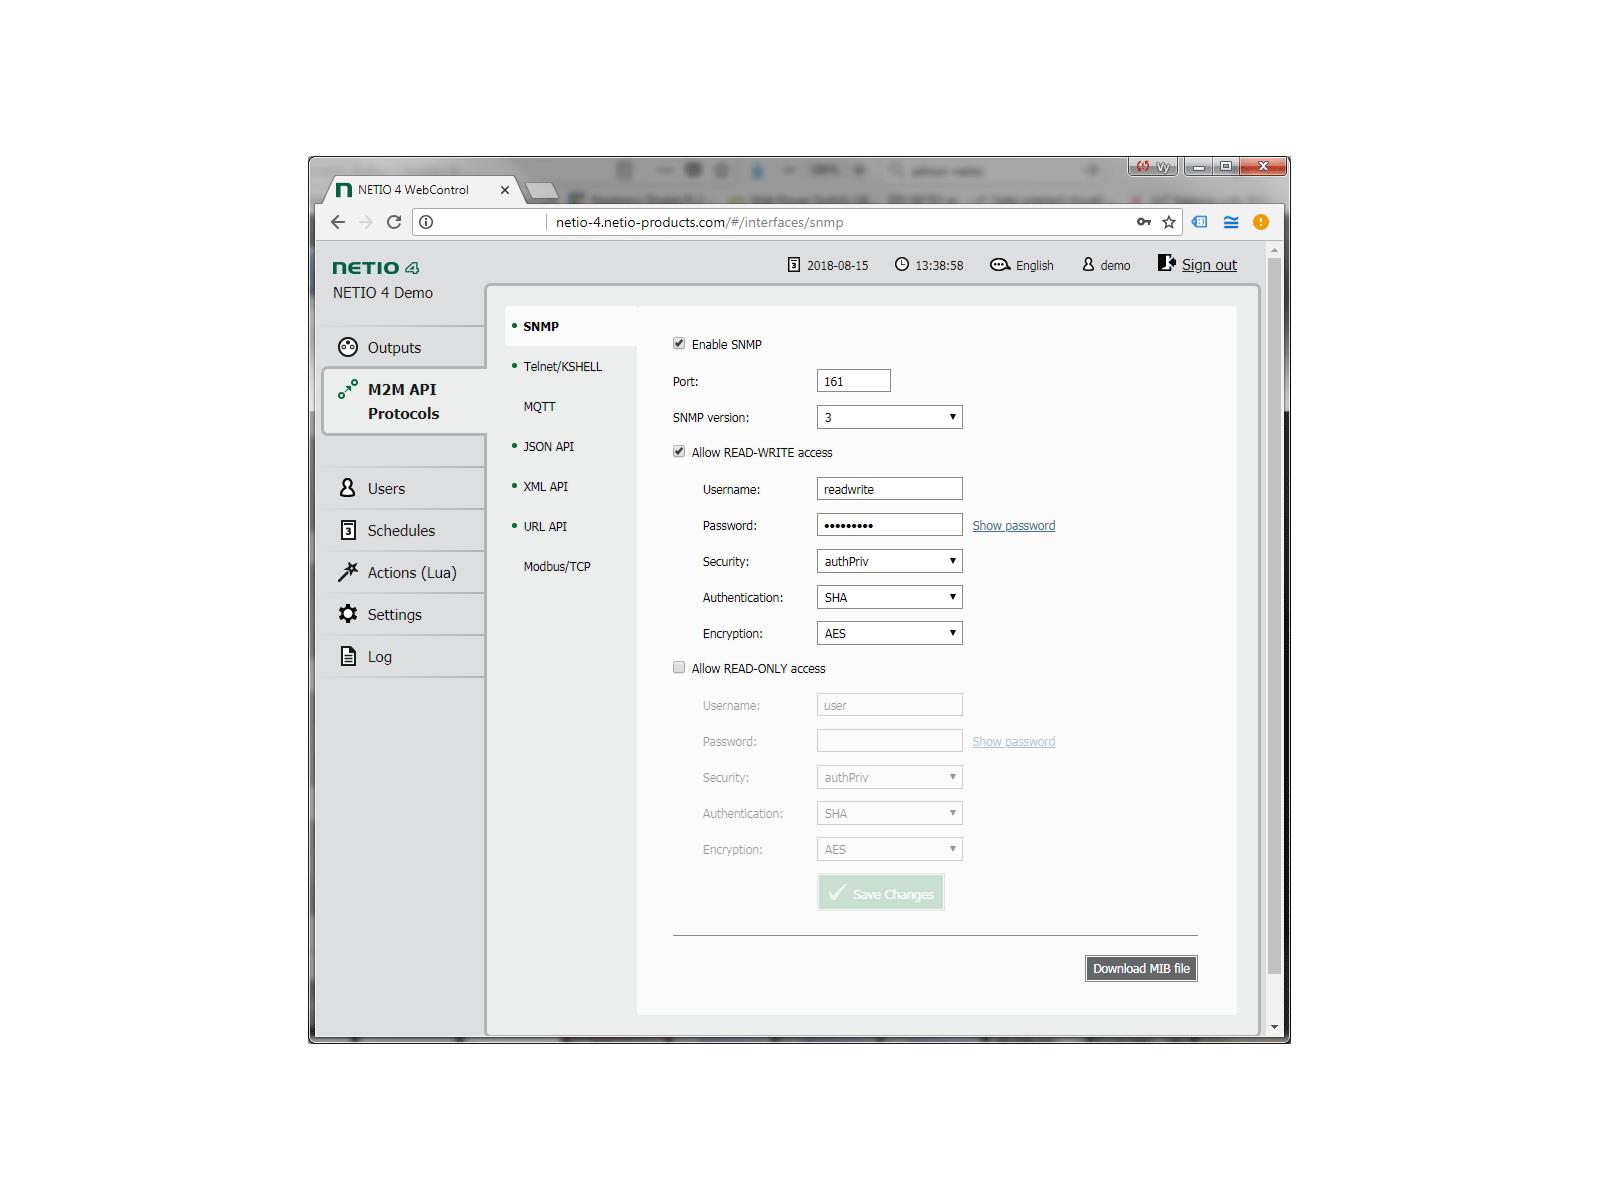 control-m autofill documentation file